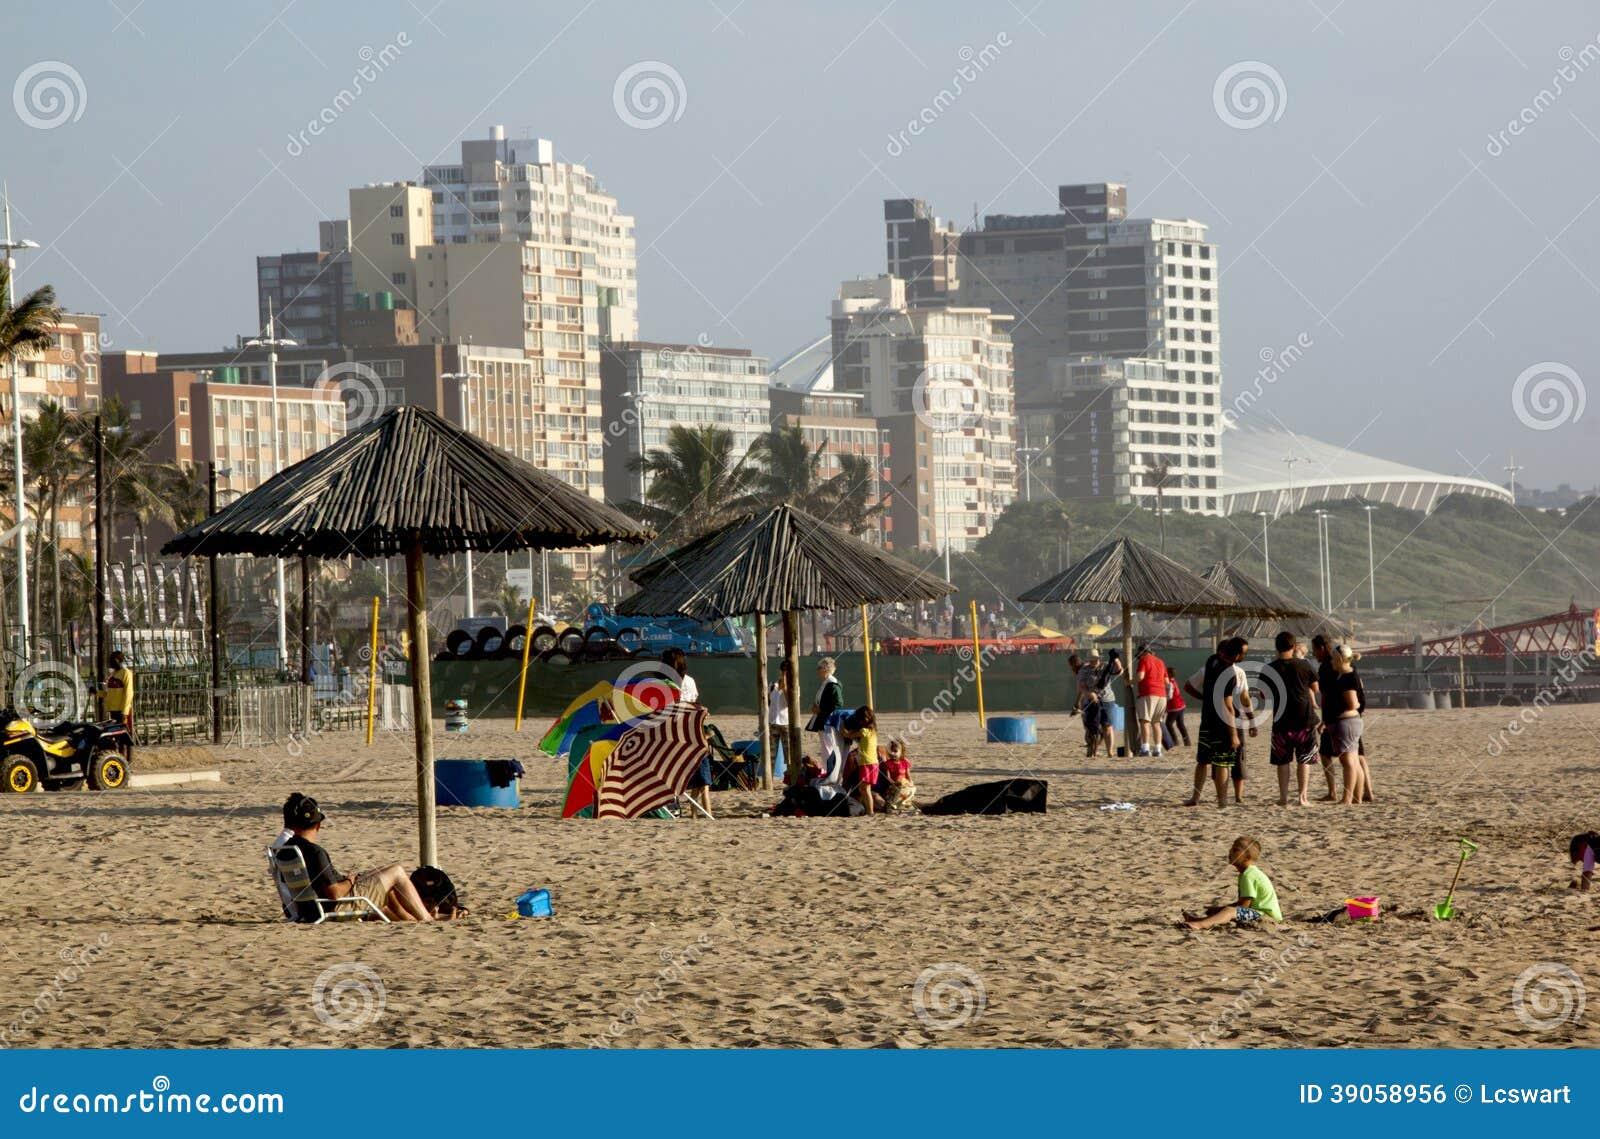 North Beach Beachfront In Durban South Africa Editorial